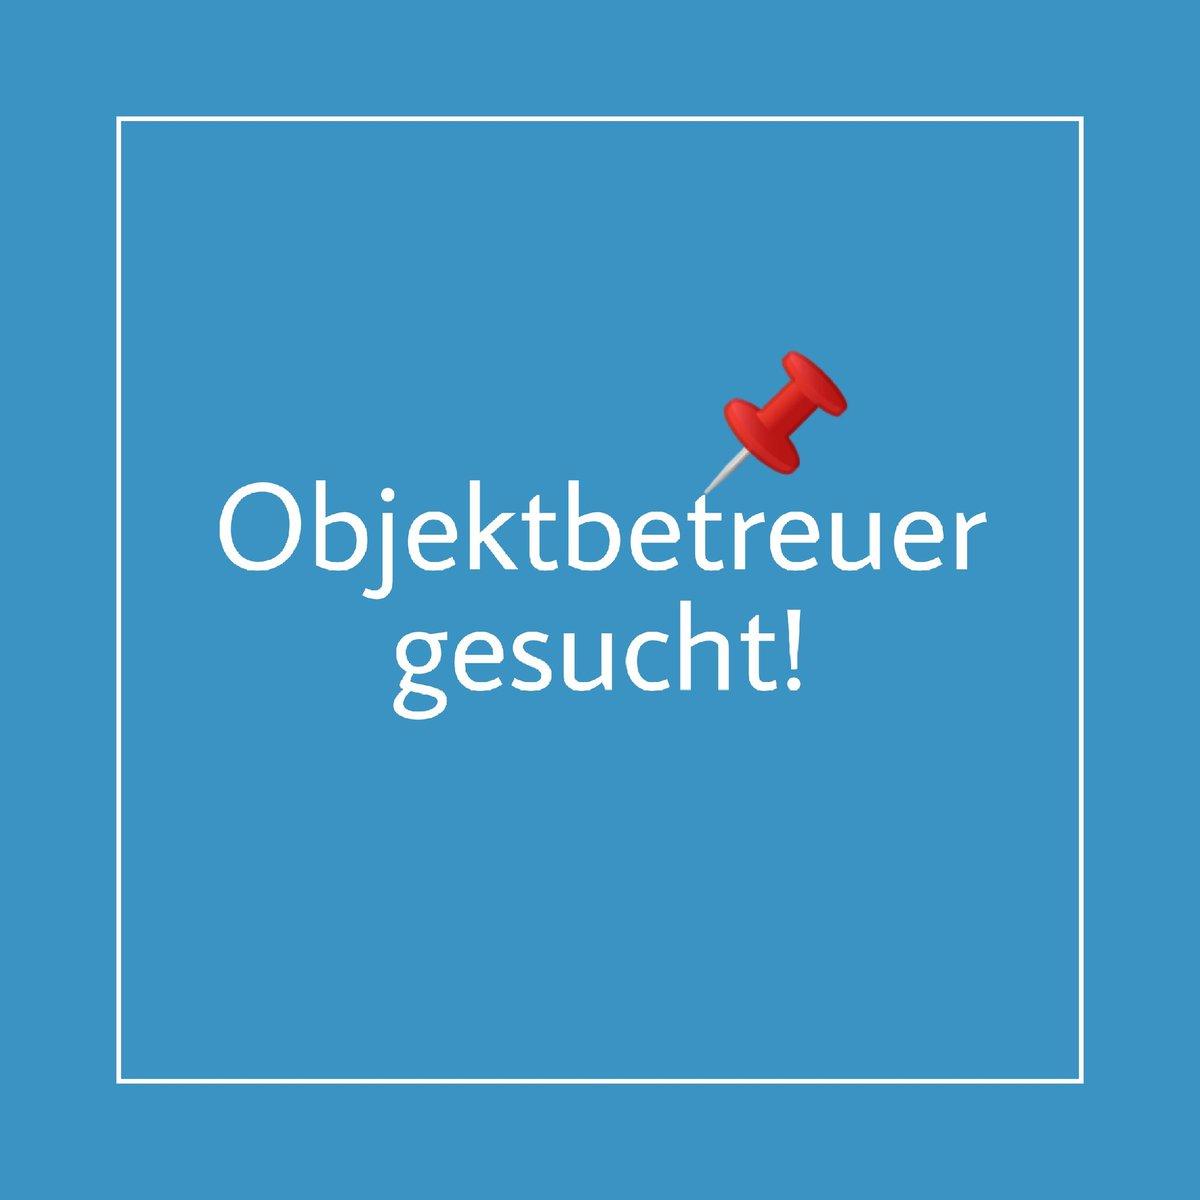 Jobbörse Merseburg